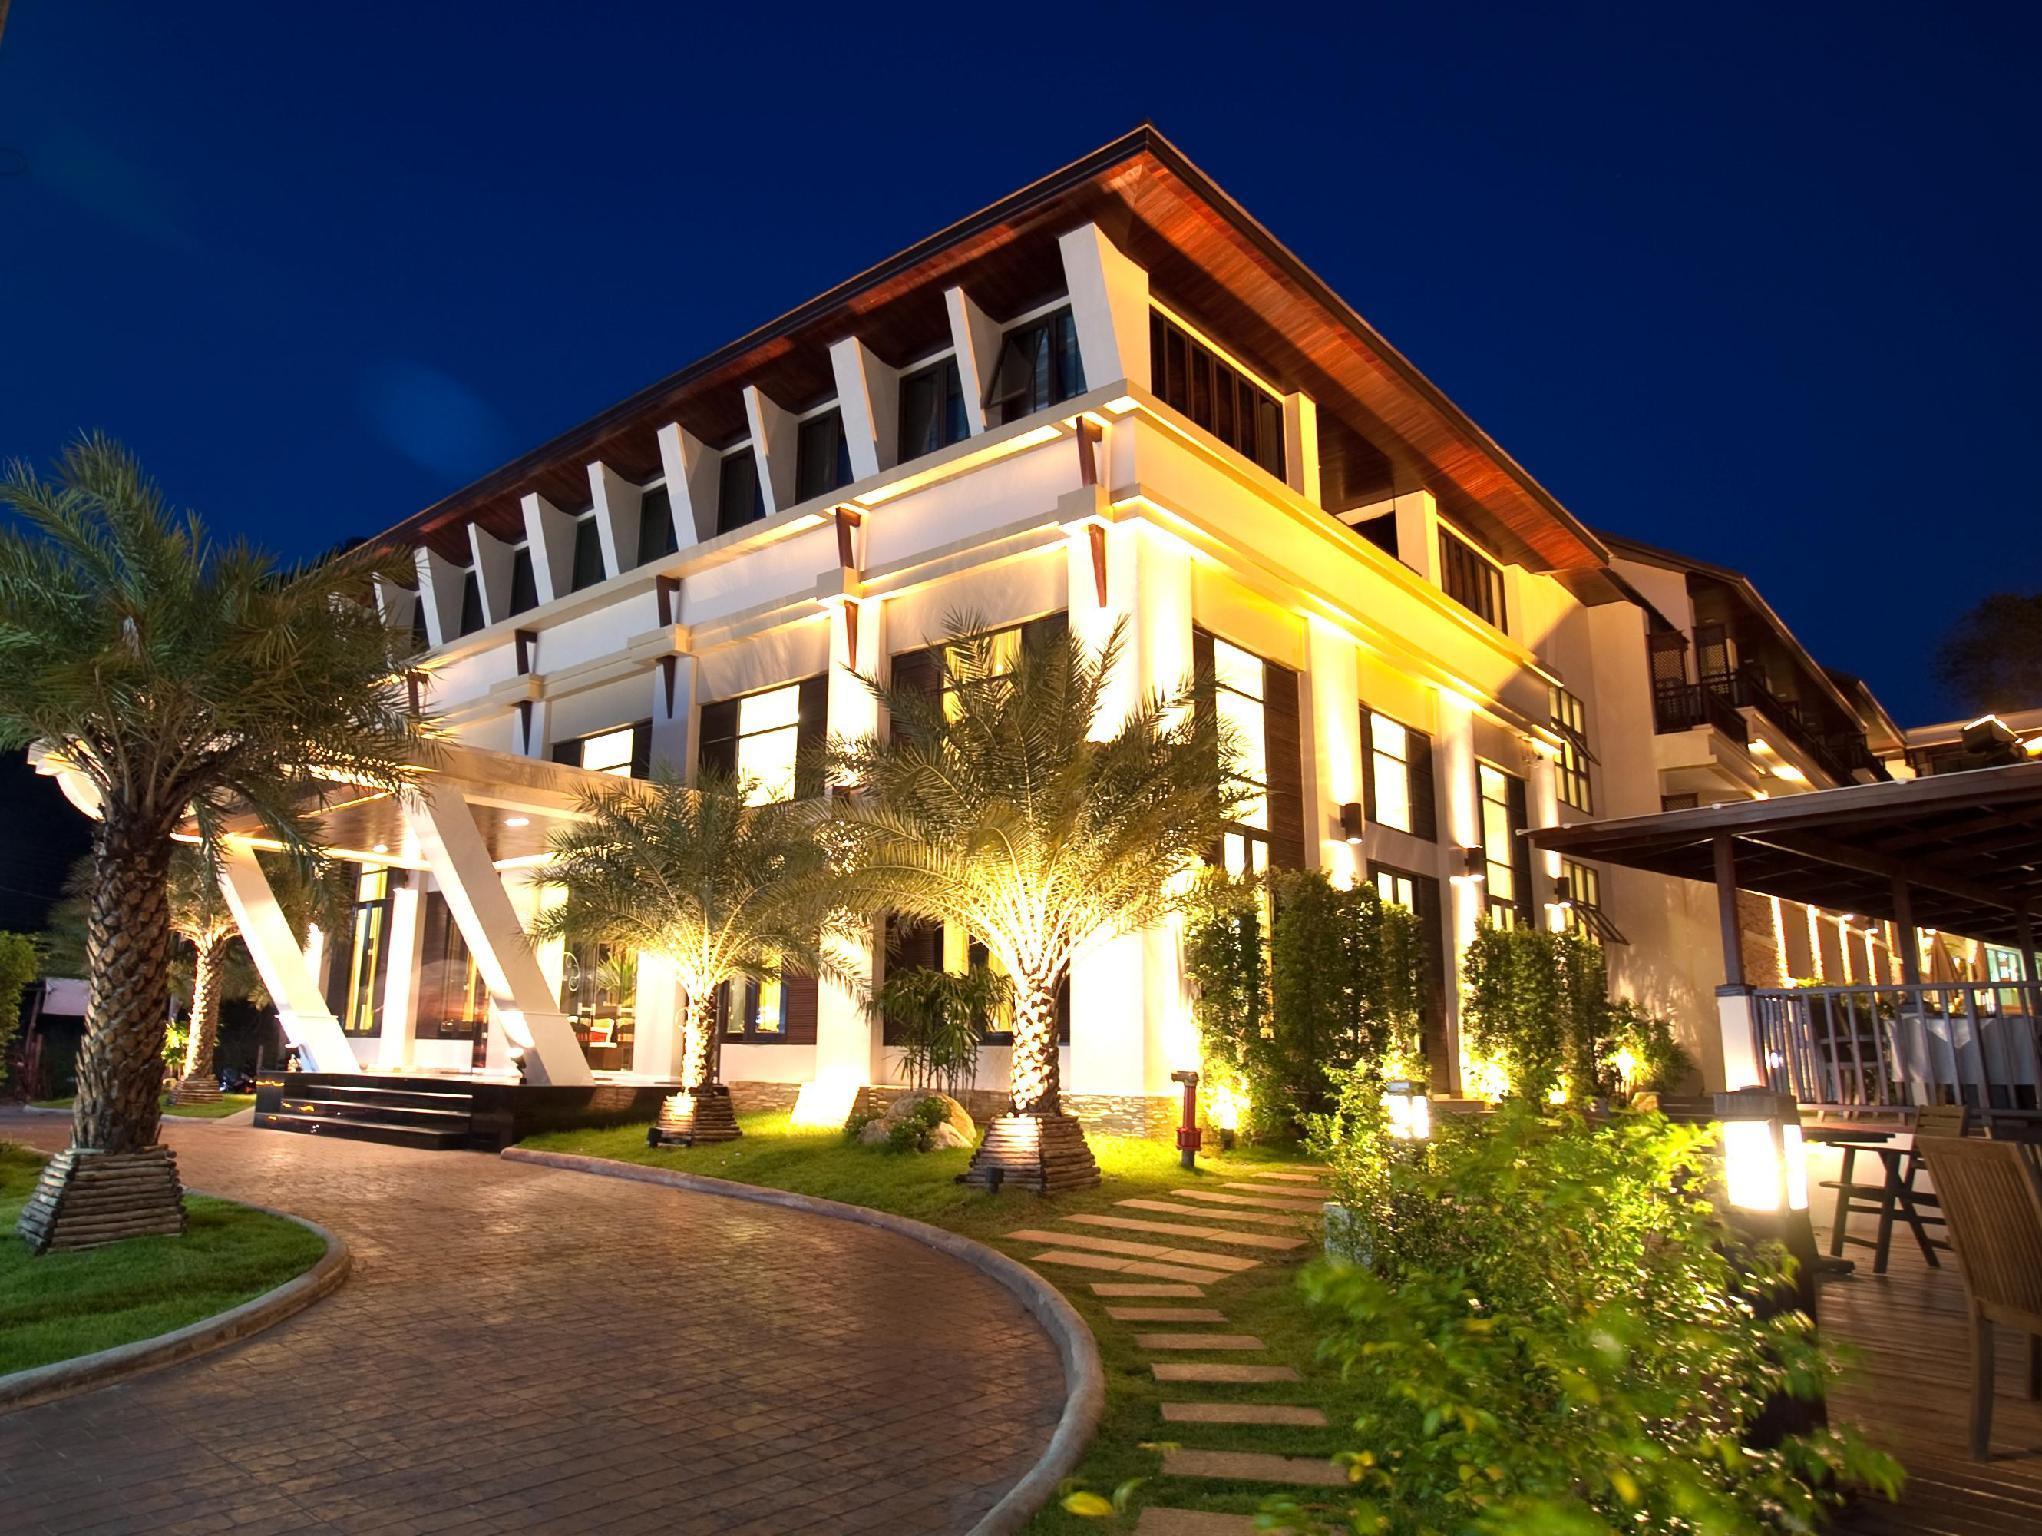 Kacha Resort & Spa Koh Chang คชา รีสอร์ท แอนด์ สปา เกาะช้าง